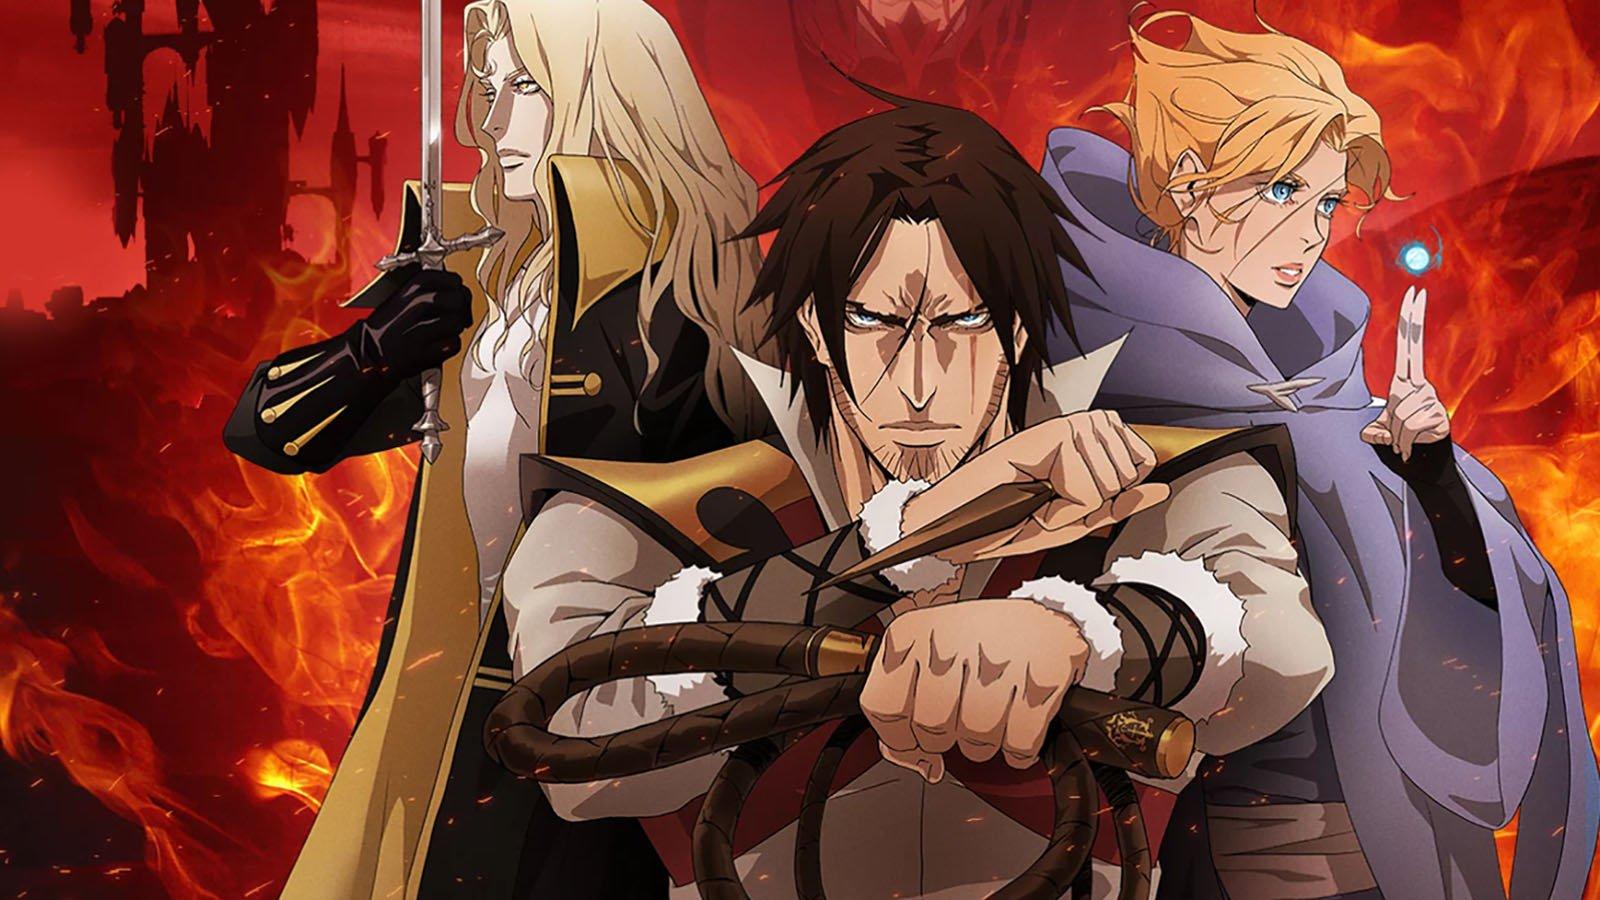 Castlevania Season 1 Review - Netflix Original Paint-by-Numbers 1